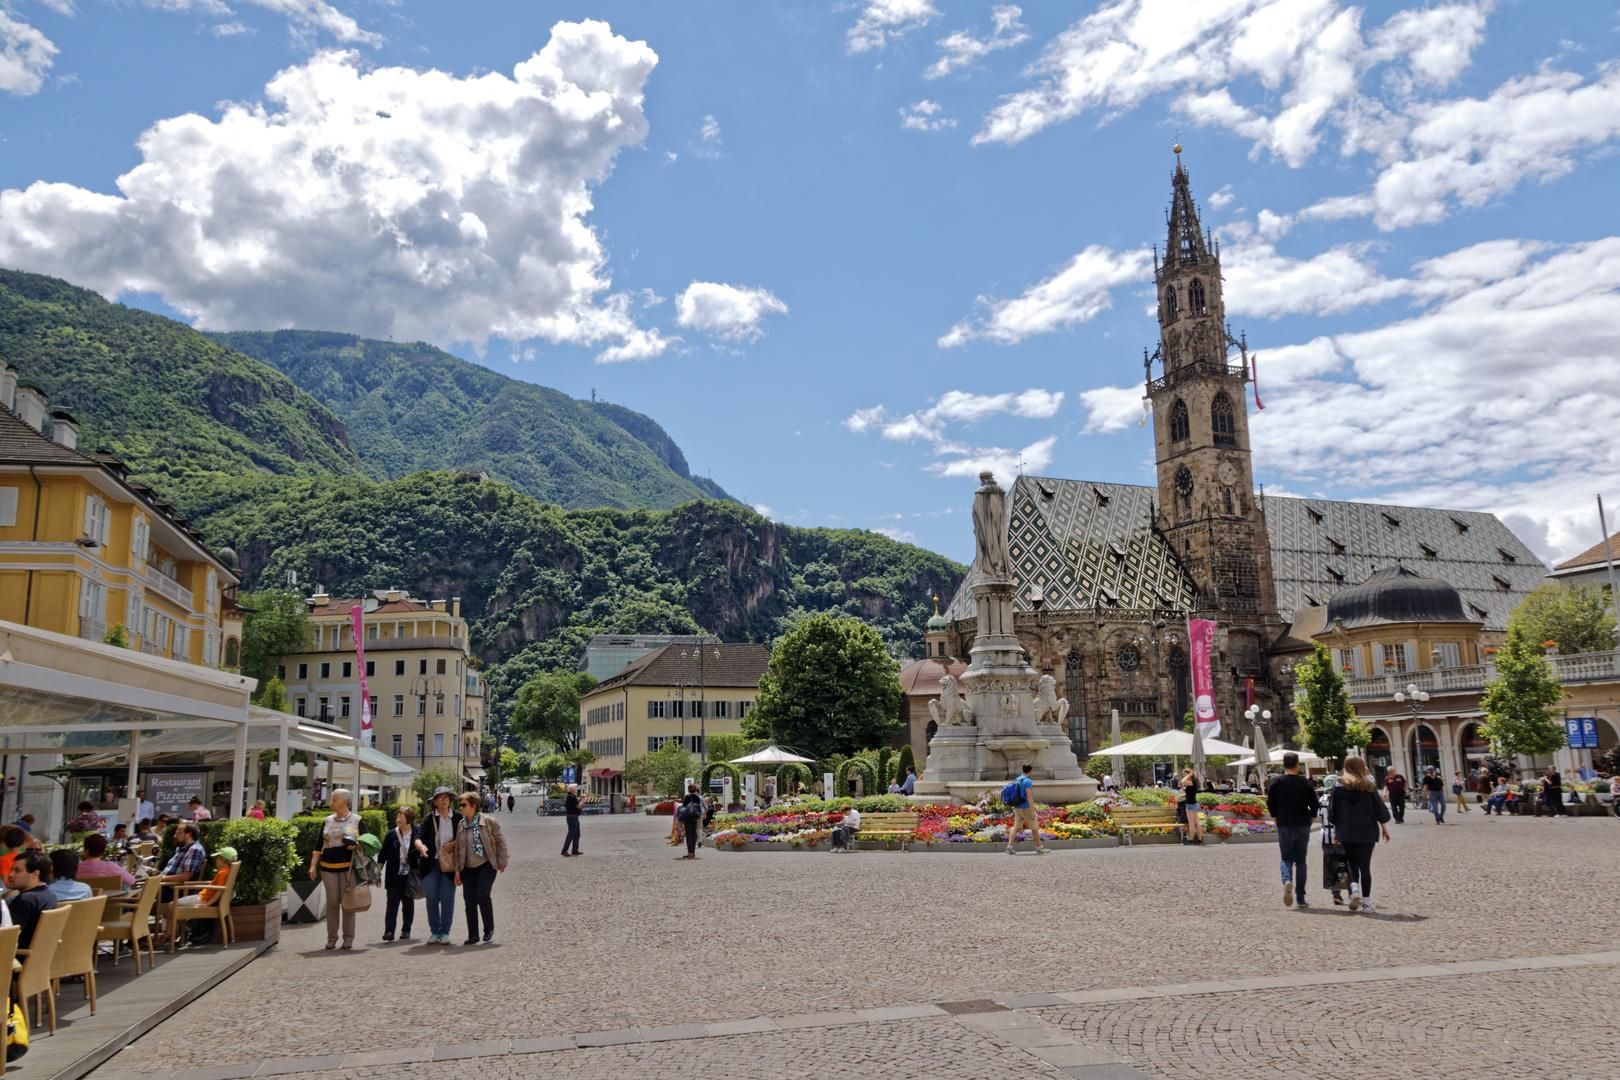 Walther vo der Vogelweide Plaza Bolzano